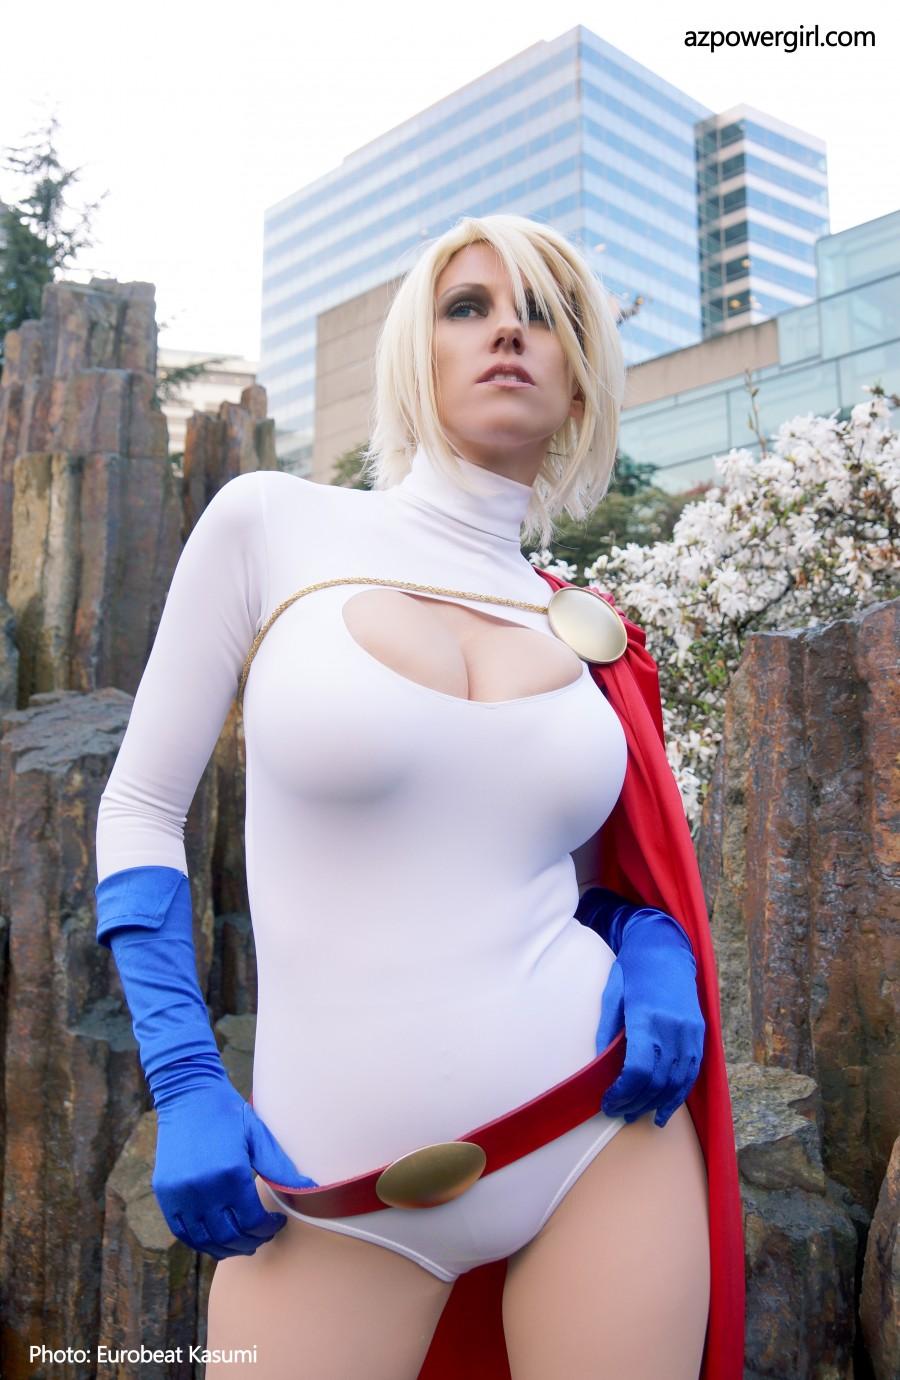 Cara nicole power girl cosplay nude taste